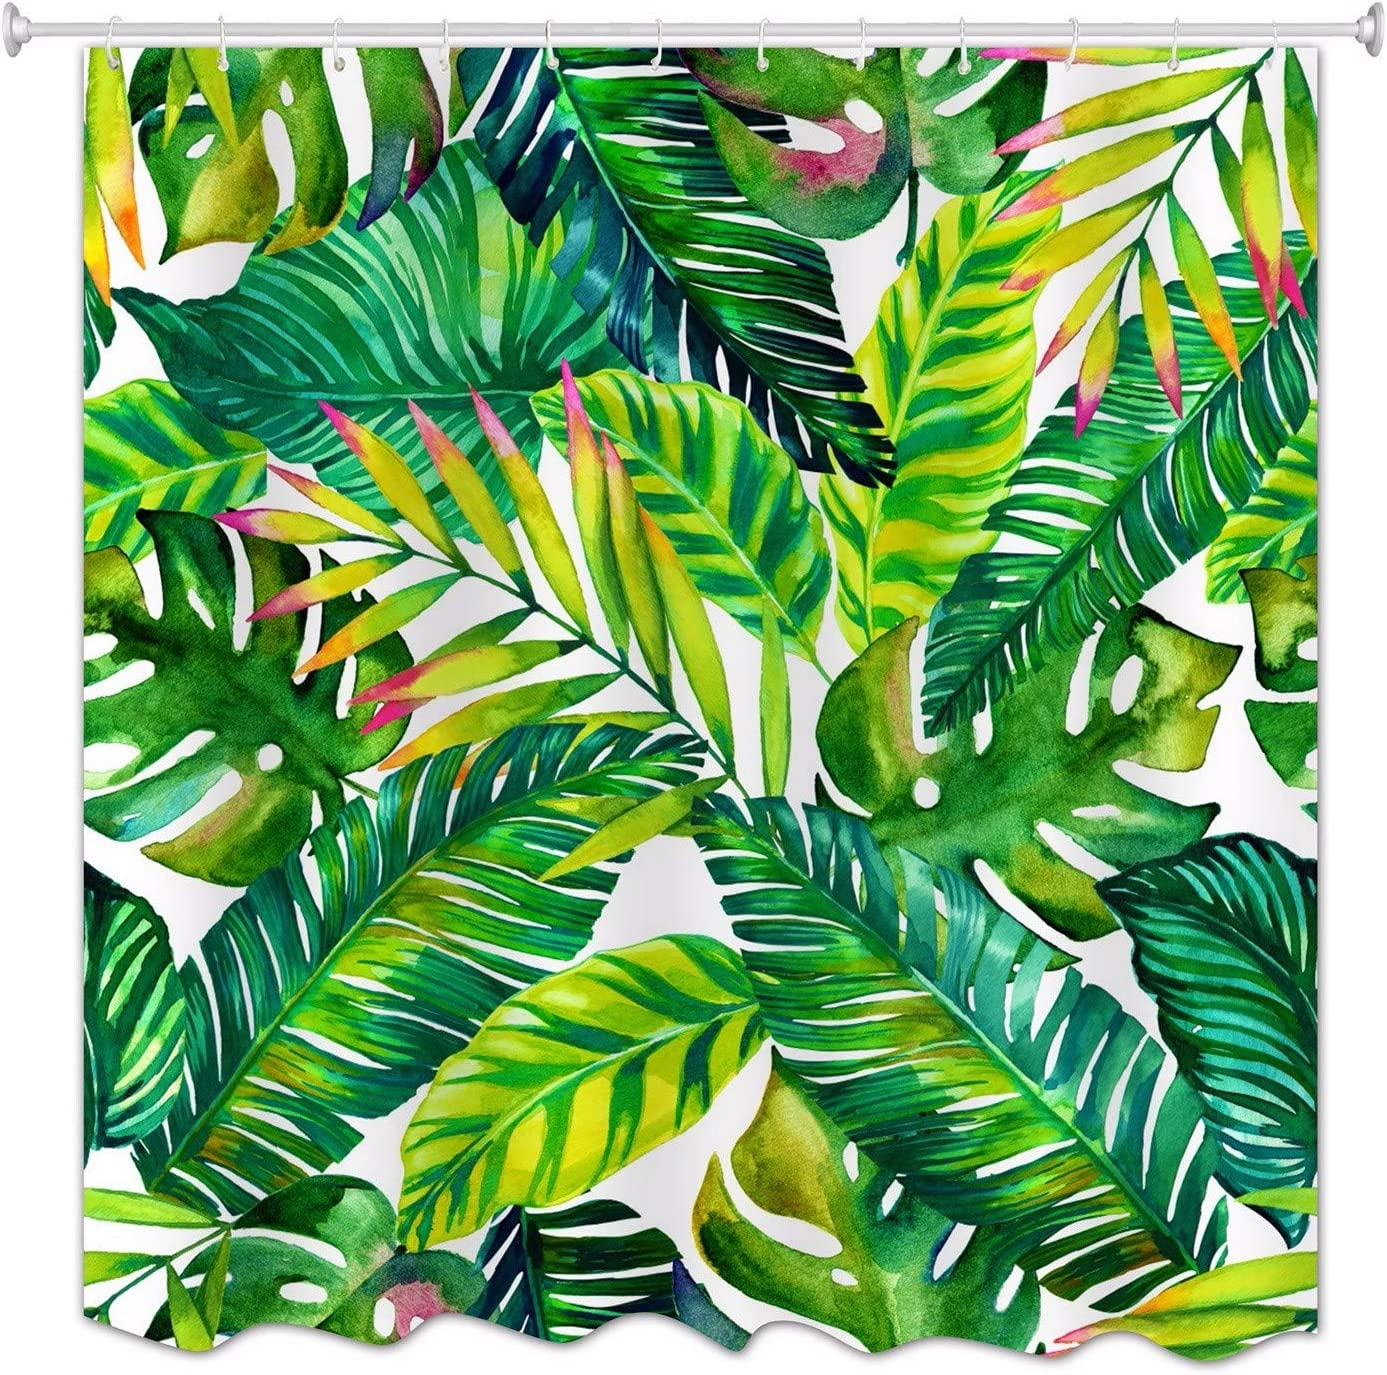 A.Monamour Hojas De Plátano Verde Tropical Hojas De Primavera Tema De Impresión De Tela Poliéster Impermeable